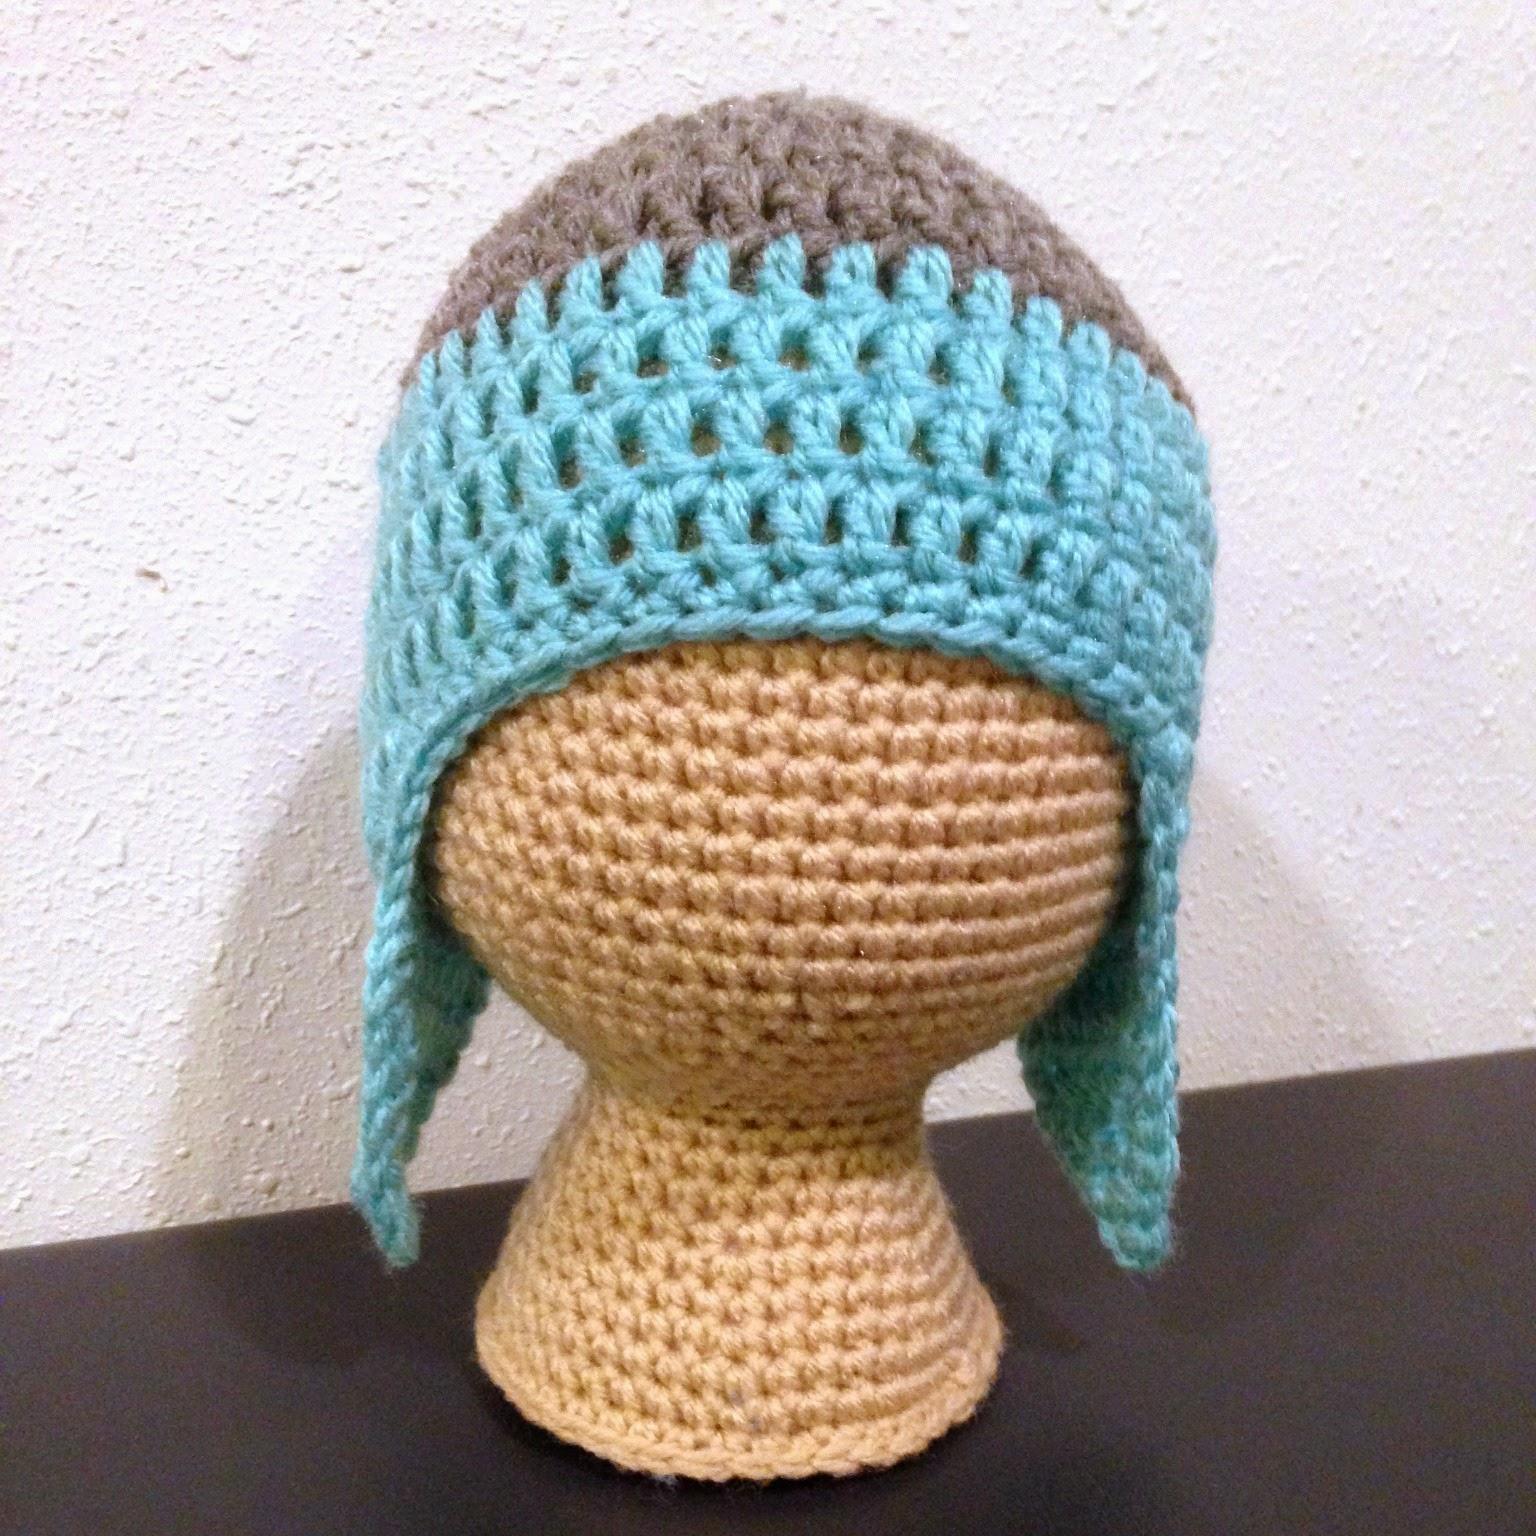 5 Little Monsters: Free Crochet Pattern- Crochet Mannequin Heads